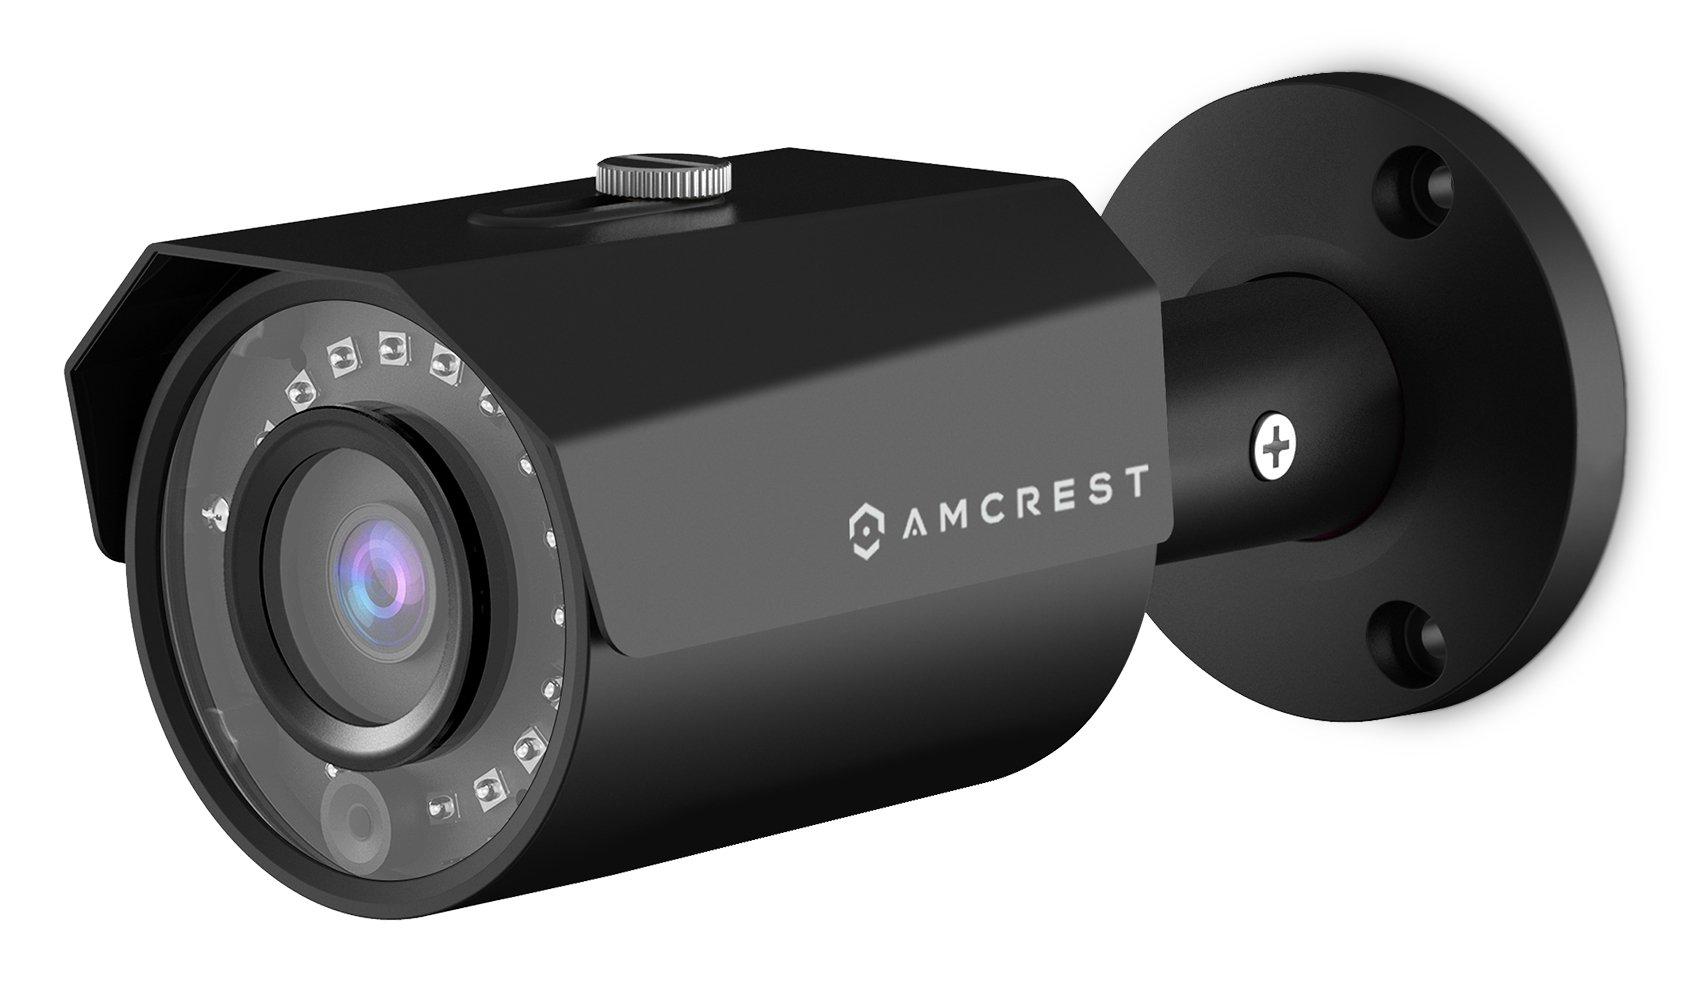 Amcrest ProHD Outdoor 1080P POE Bullet IP Security Camera - IP67 Weatherproof, 1080P (1920 TVL), IP2M-843EB (Black)